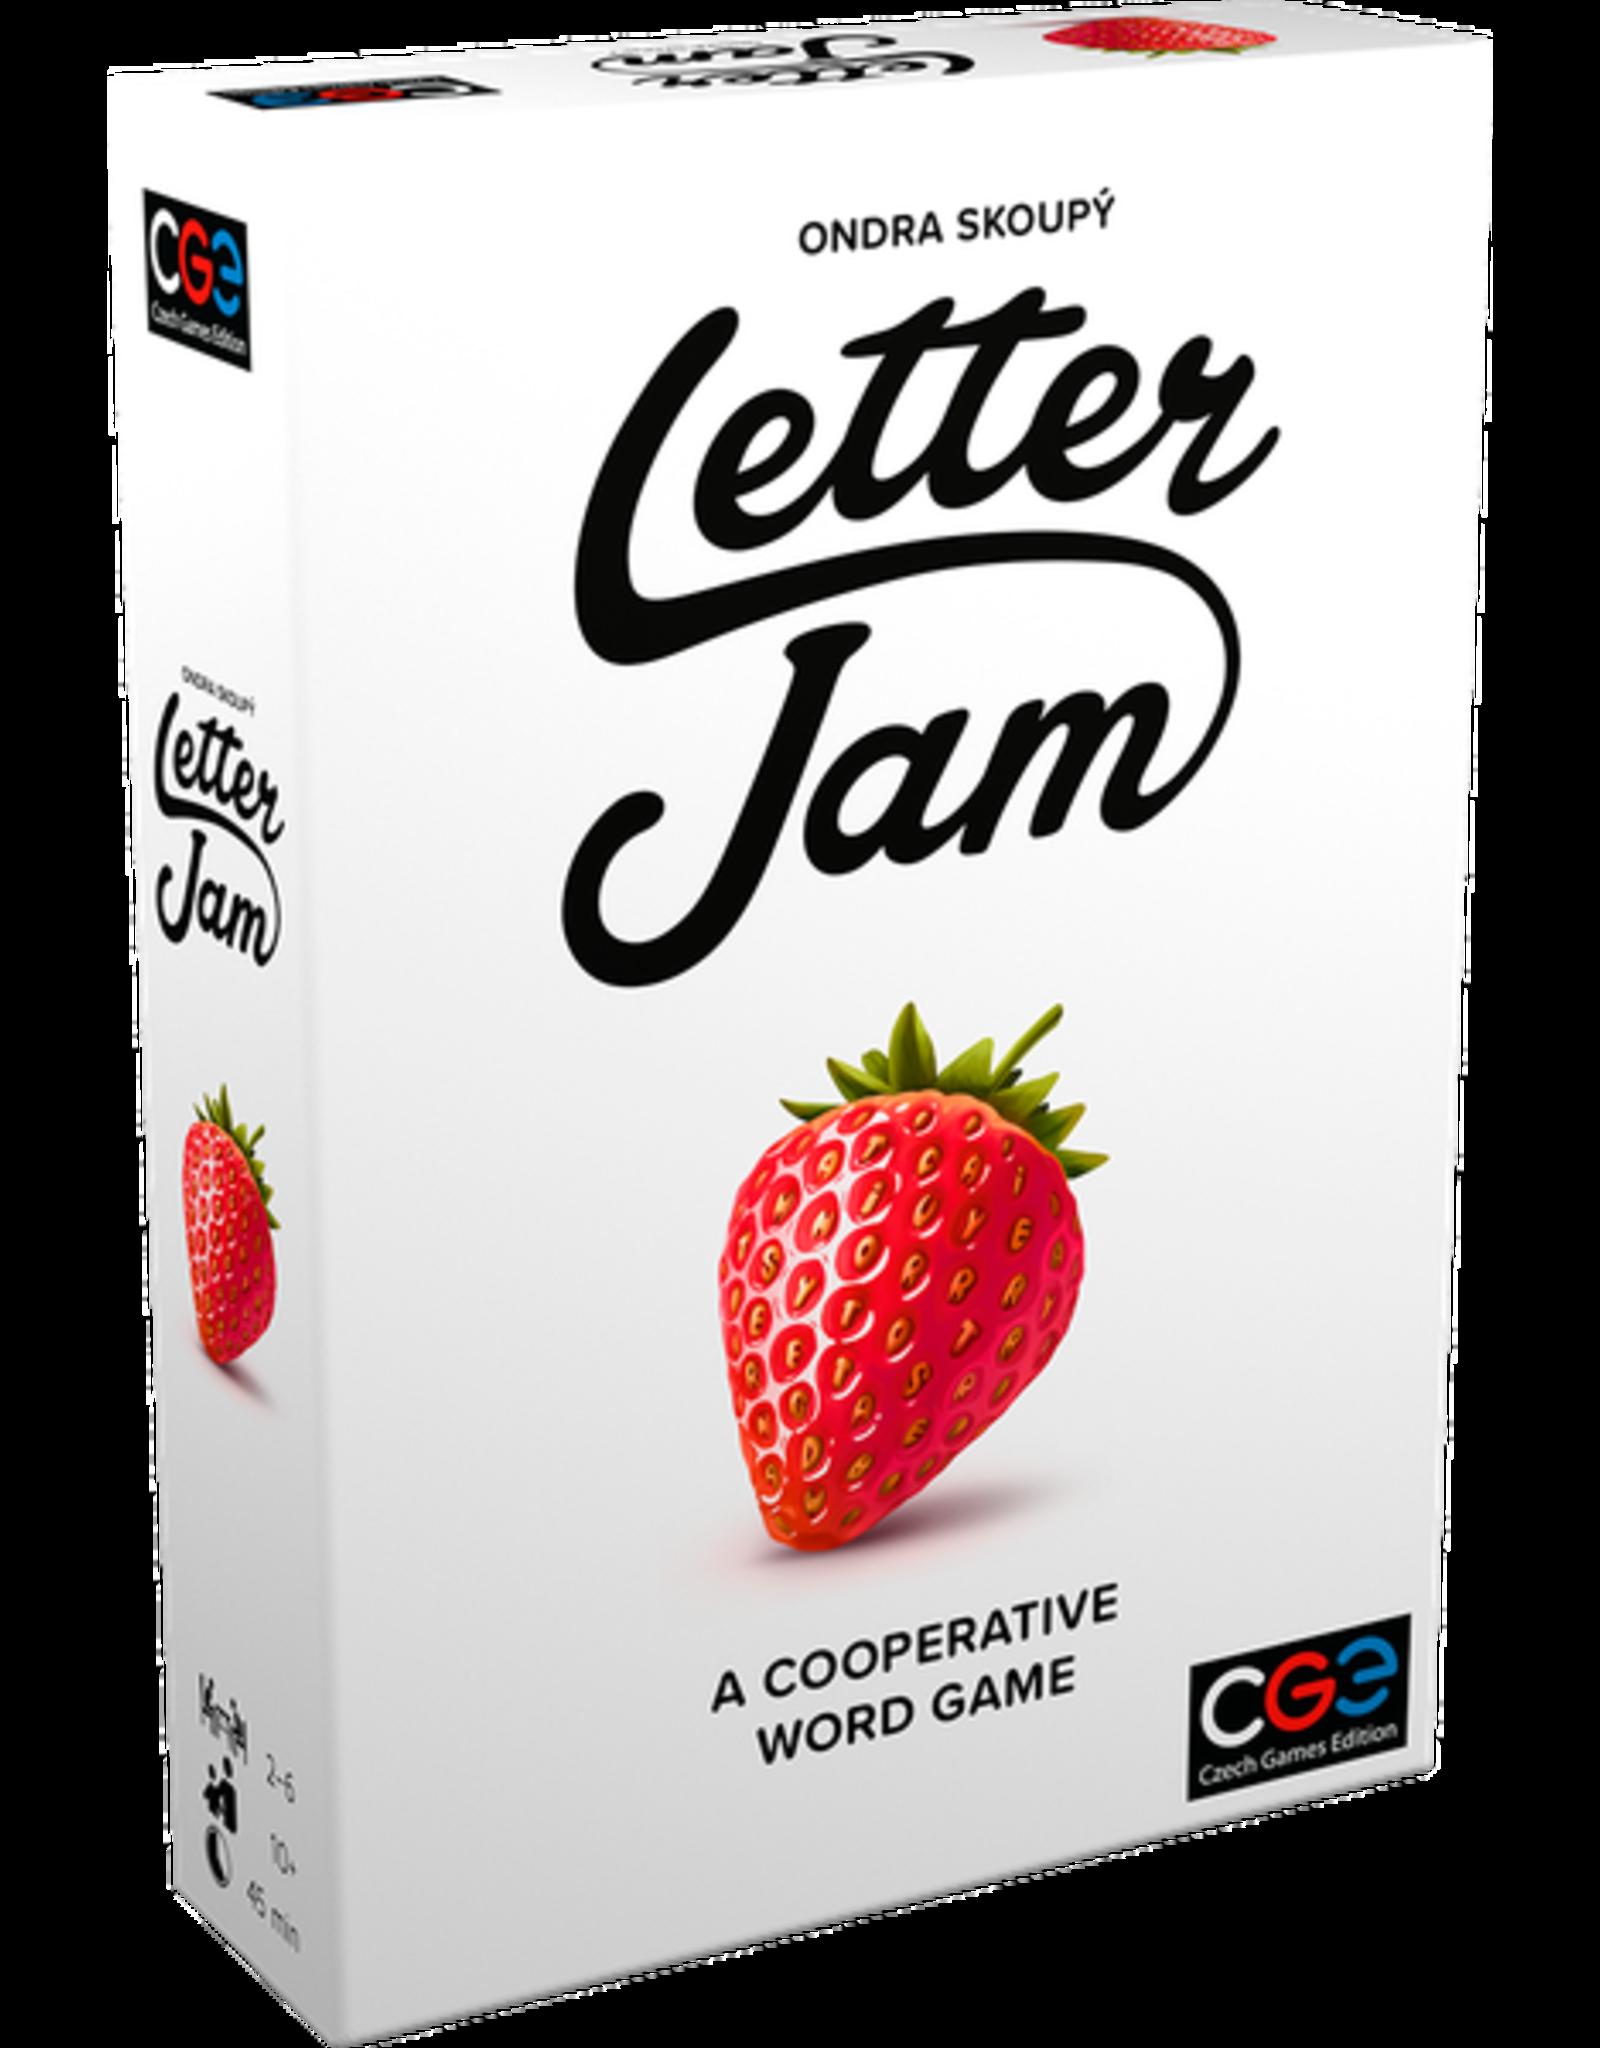 CZECH GAMES EDITION LETTER JAM